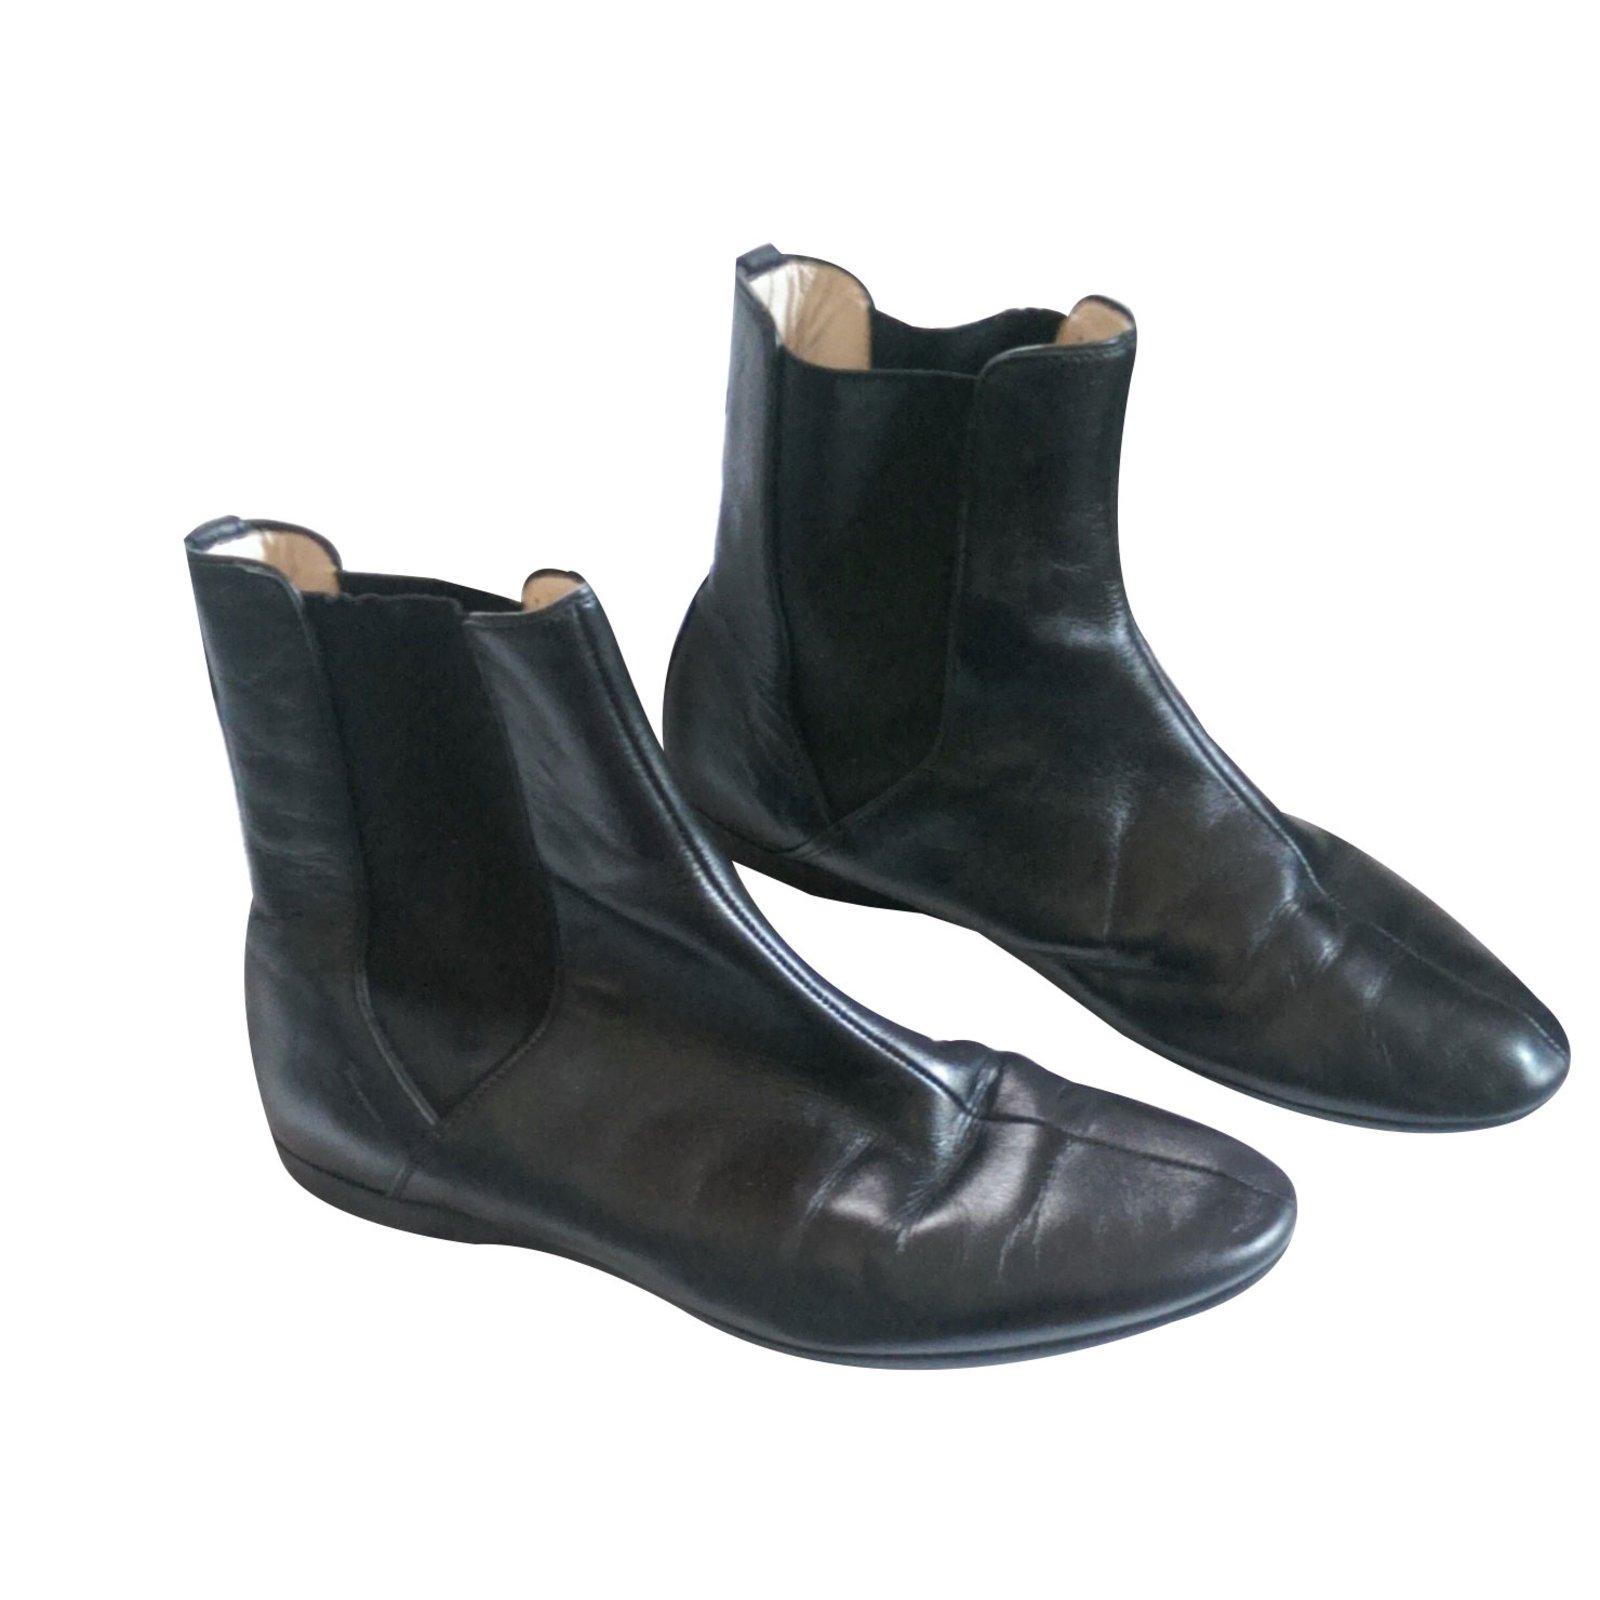 Salvatore Ferragamo Ankle Boots Ankle